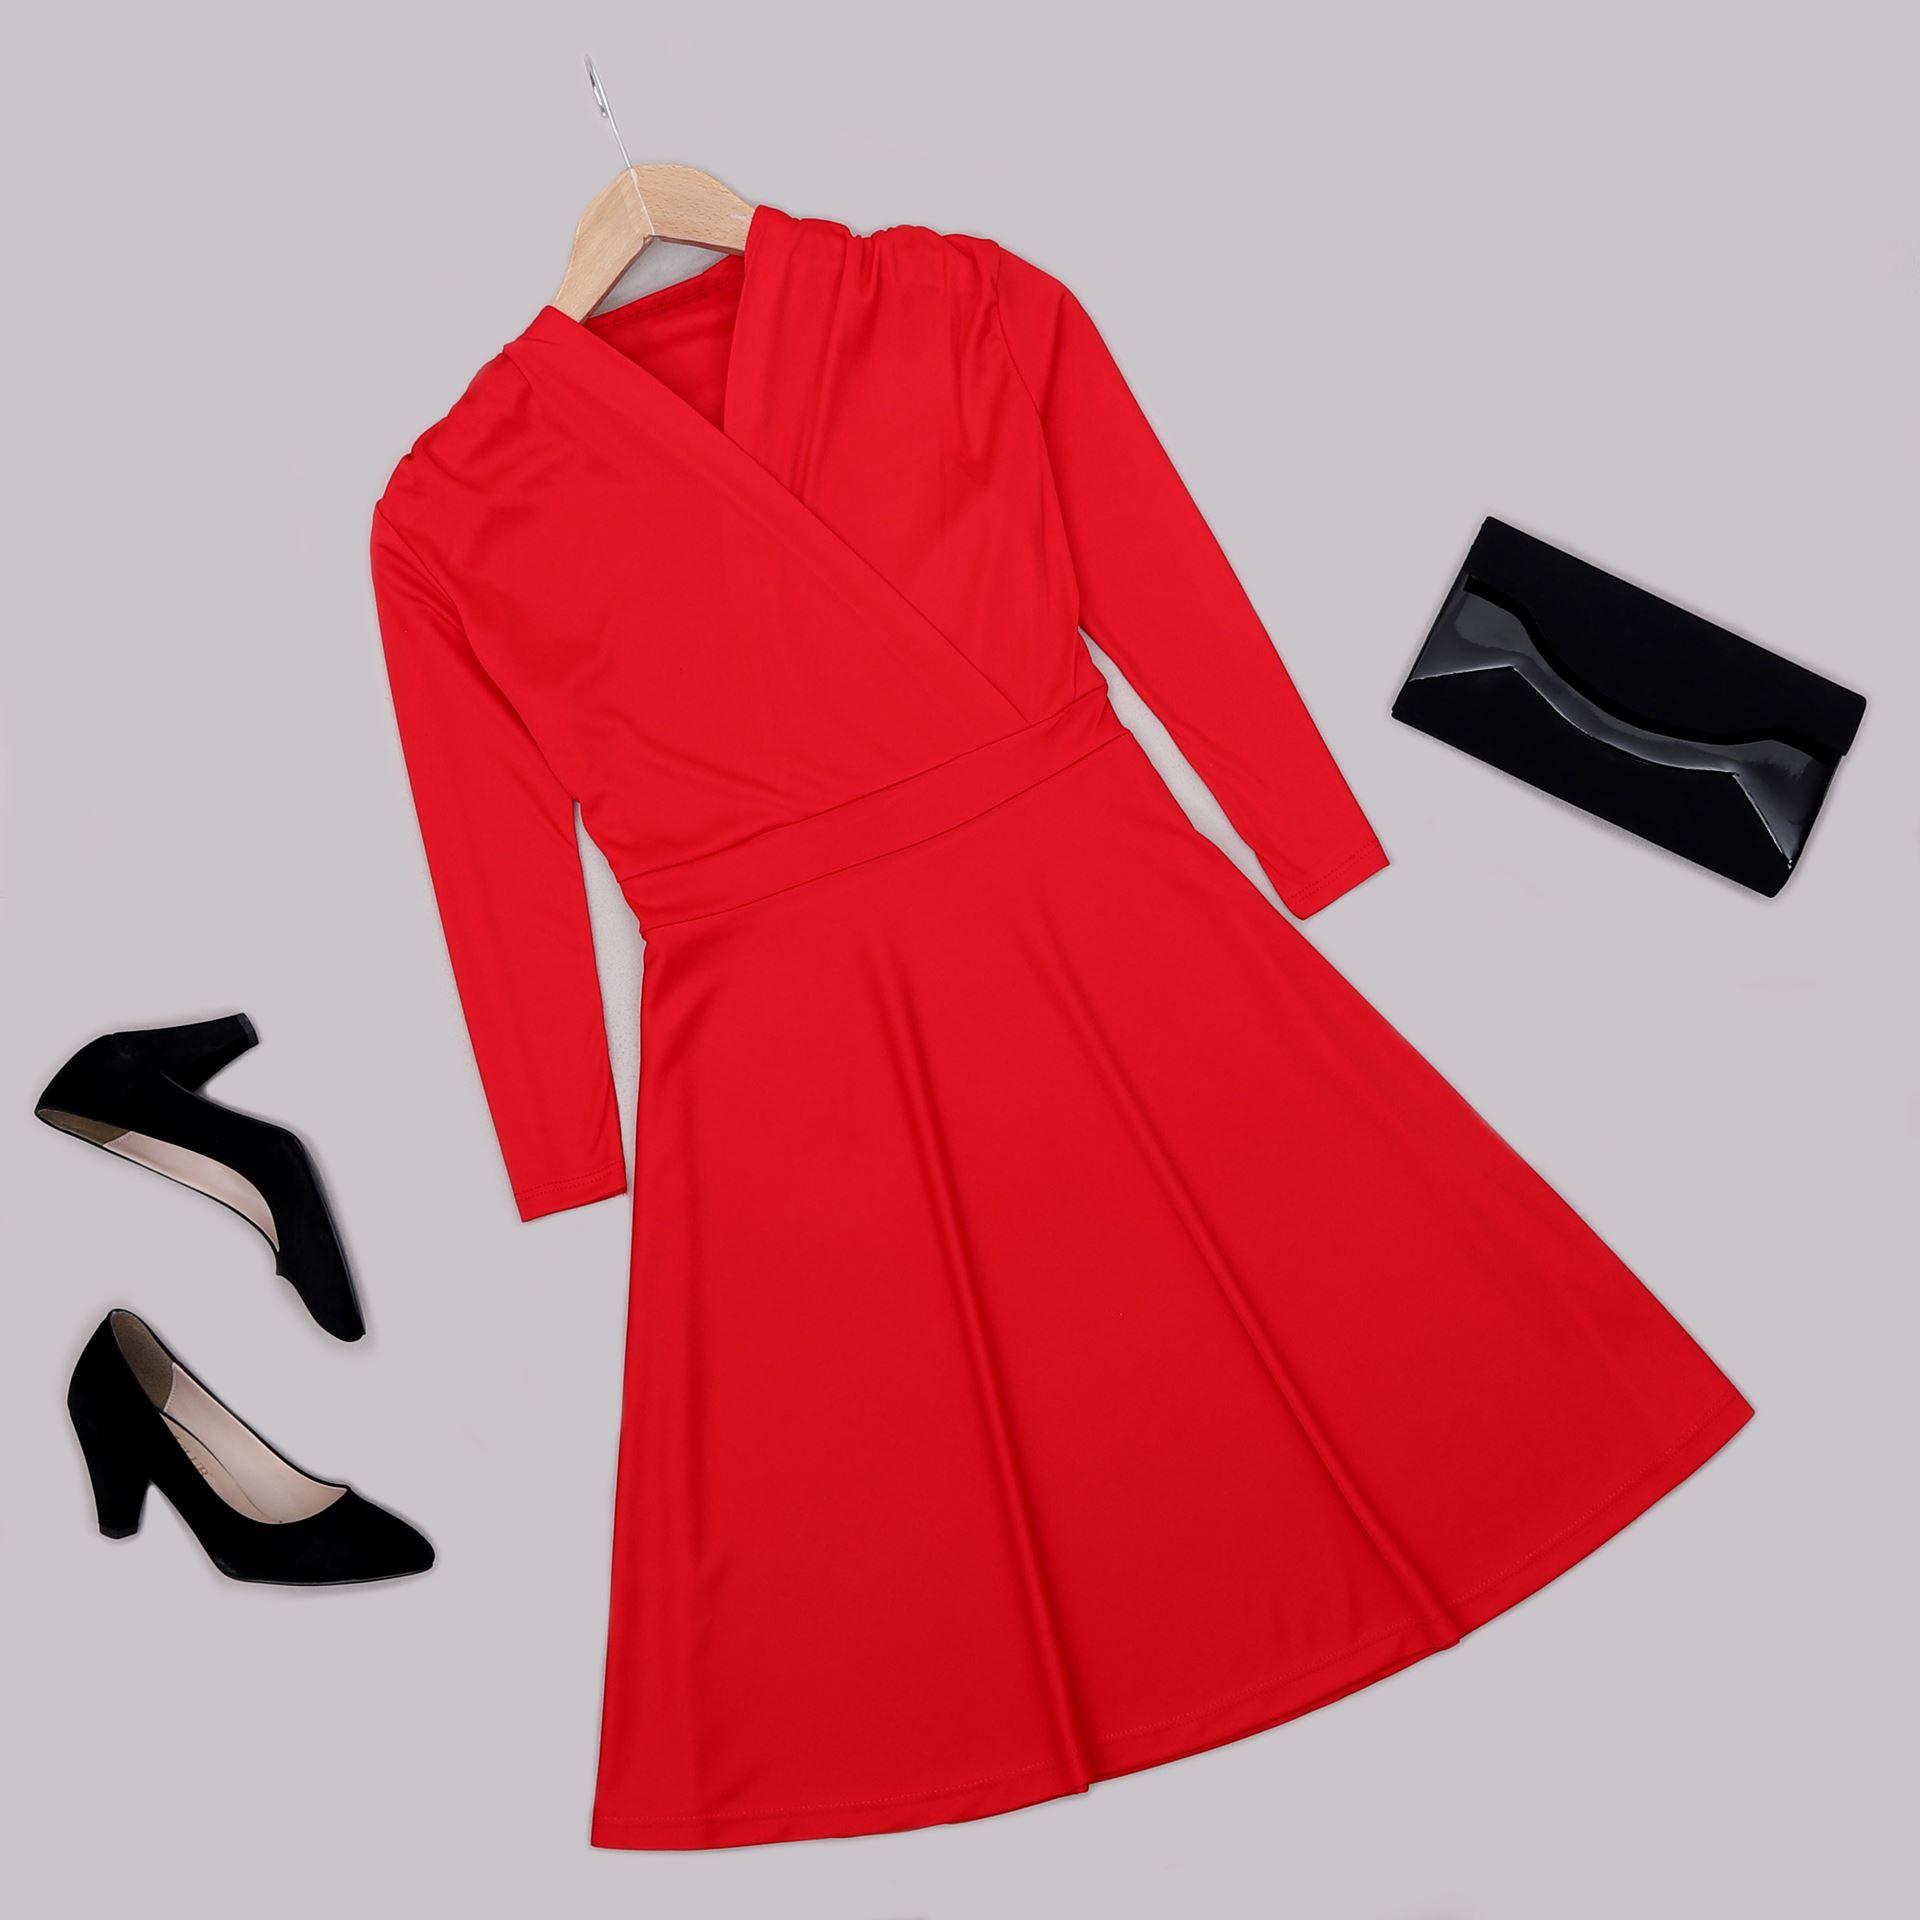 Kırmızı Kruvaze Yaka Elbise ELB548